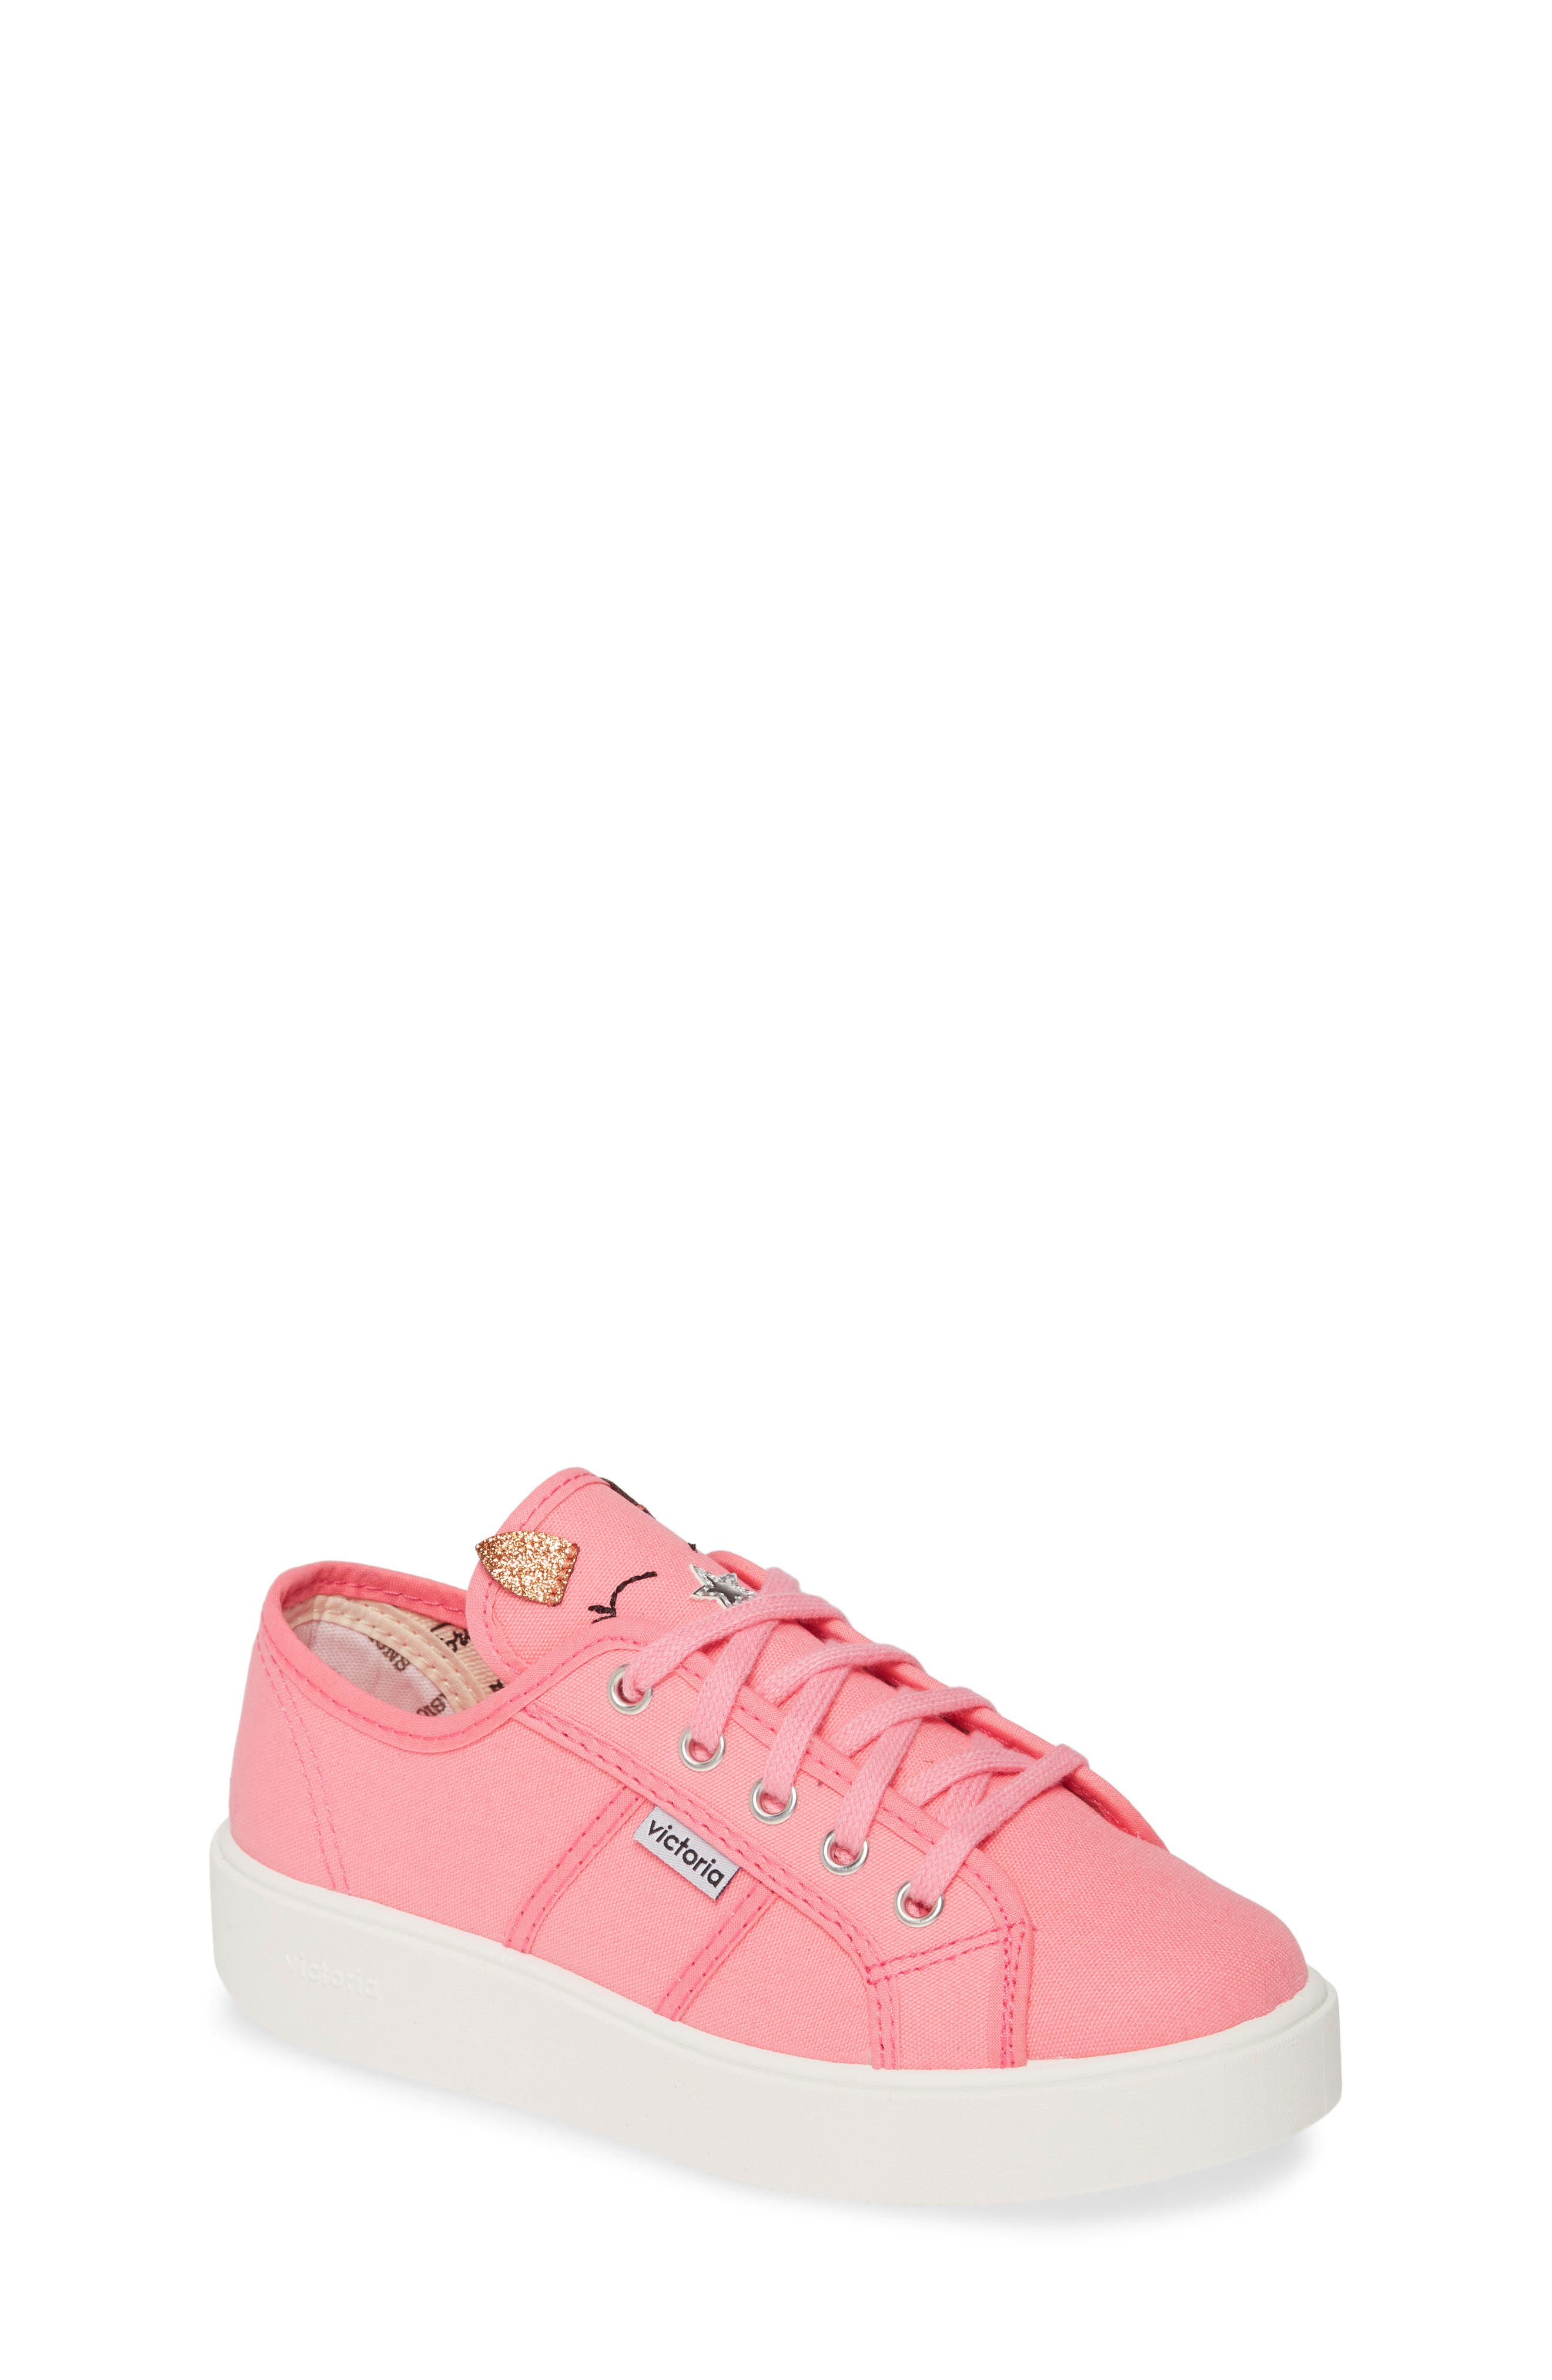 Toddler Girls Victoria Shoes Utopia Lona Animales Sneaker Size 115US  29EU  Pink